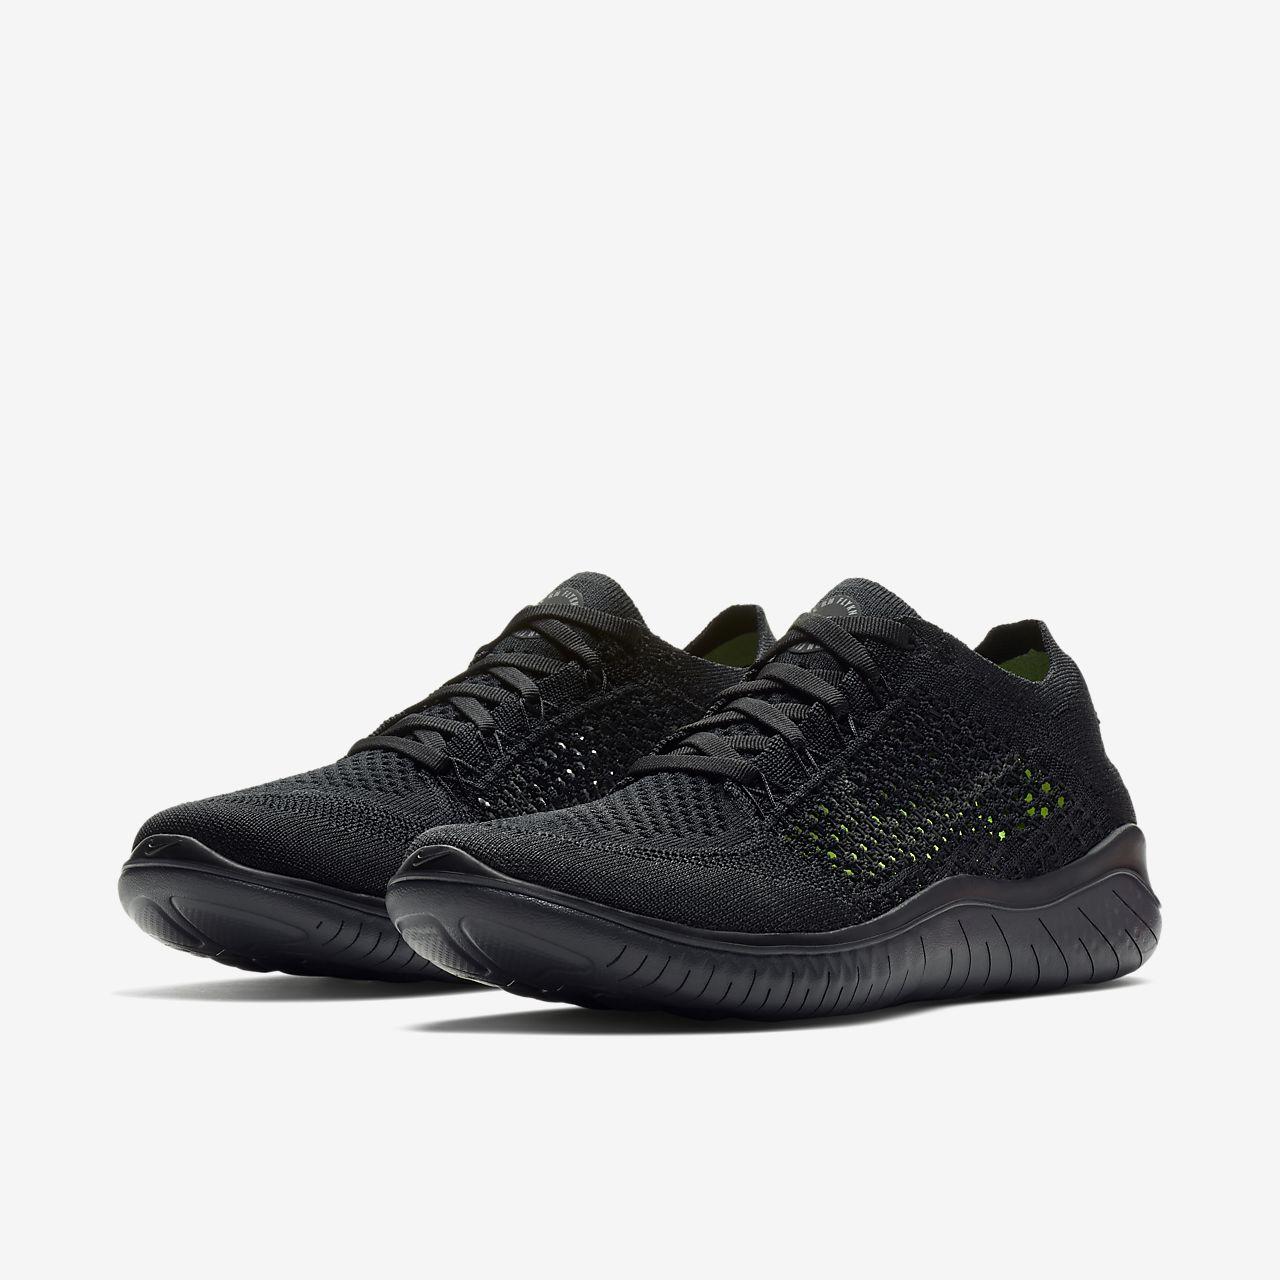 best sneakers ee4d7 c83ff Chaussure Nike 2018 Running Free Pour Flyknit Femme Ma Rn De